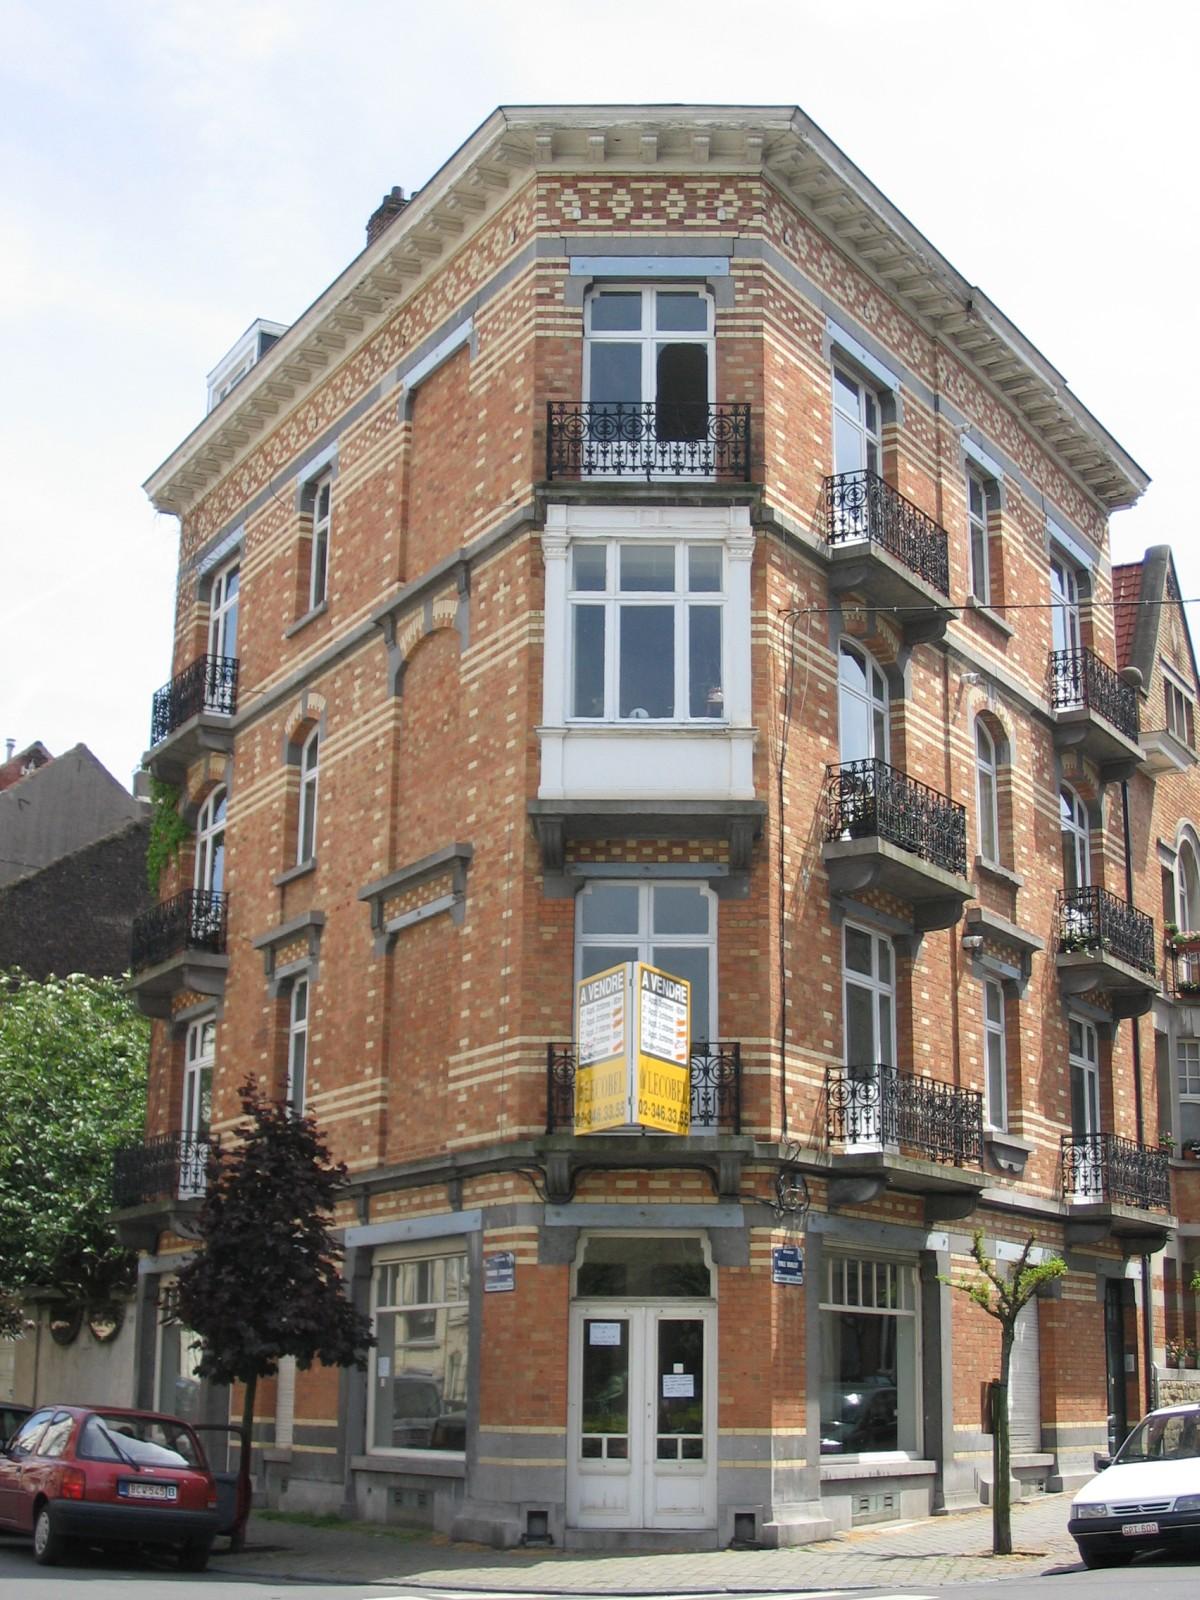 Emile Bouilliotstraat 18-20, architecte Joseph Hallaux, 1913., 2007